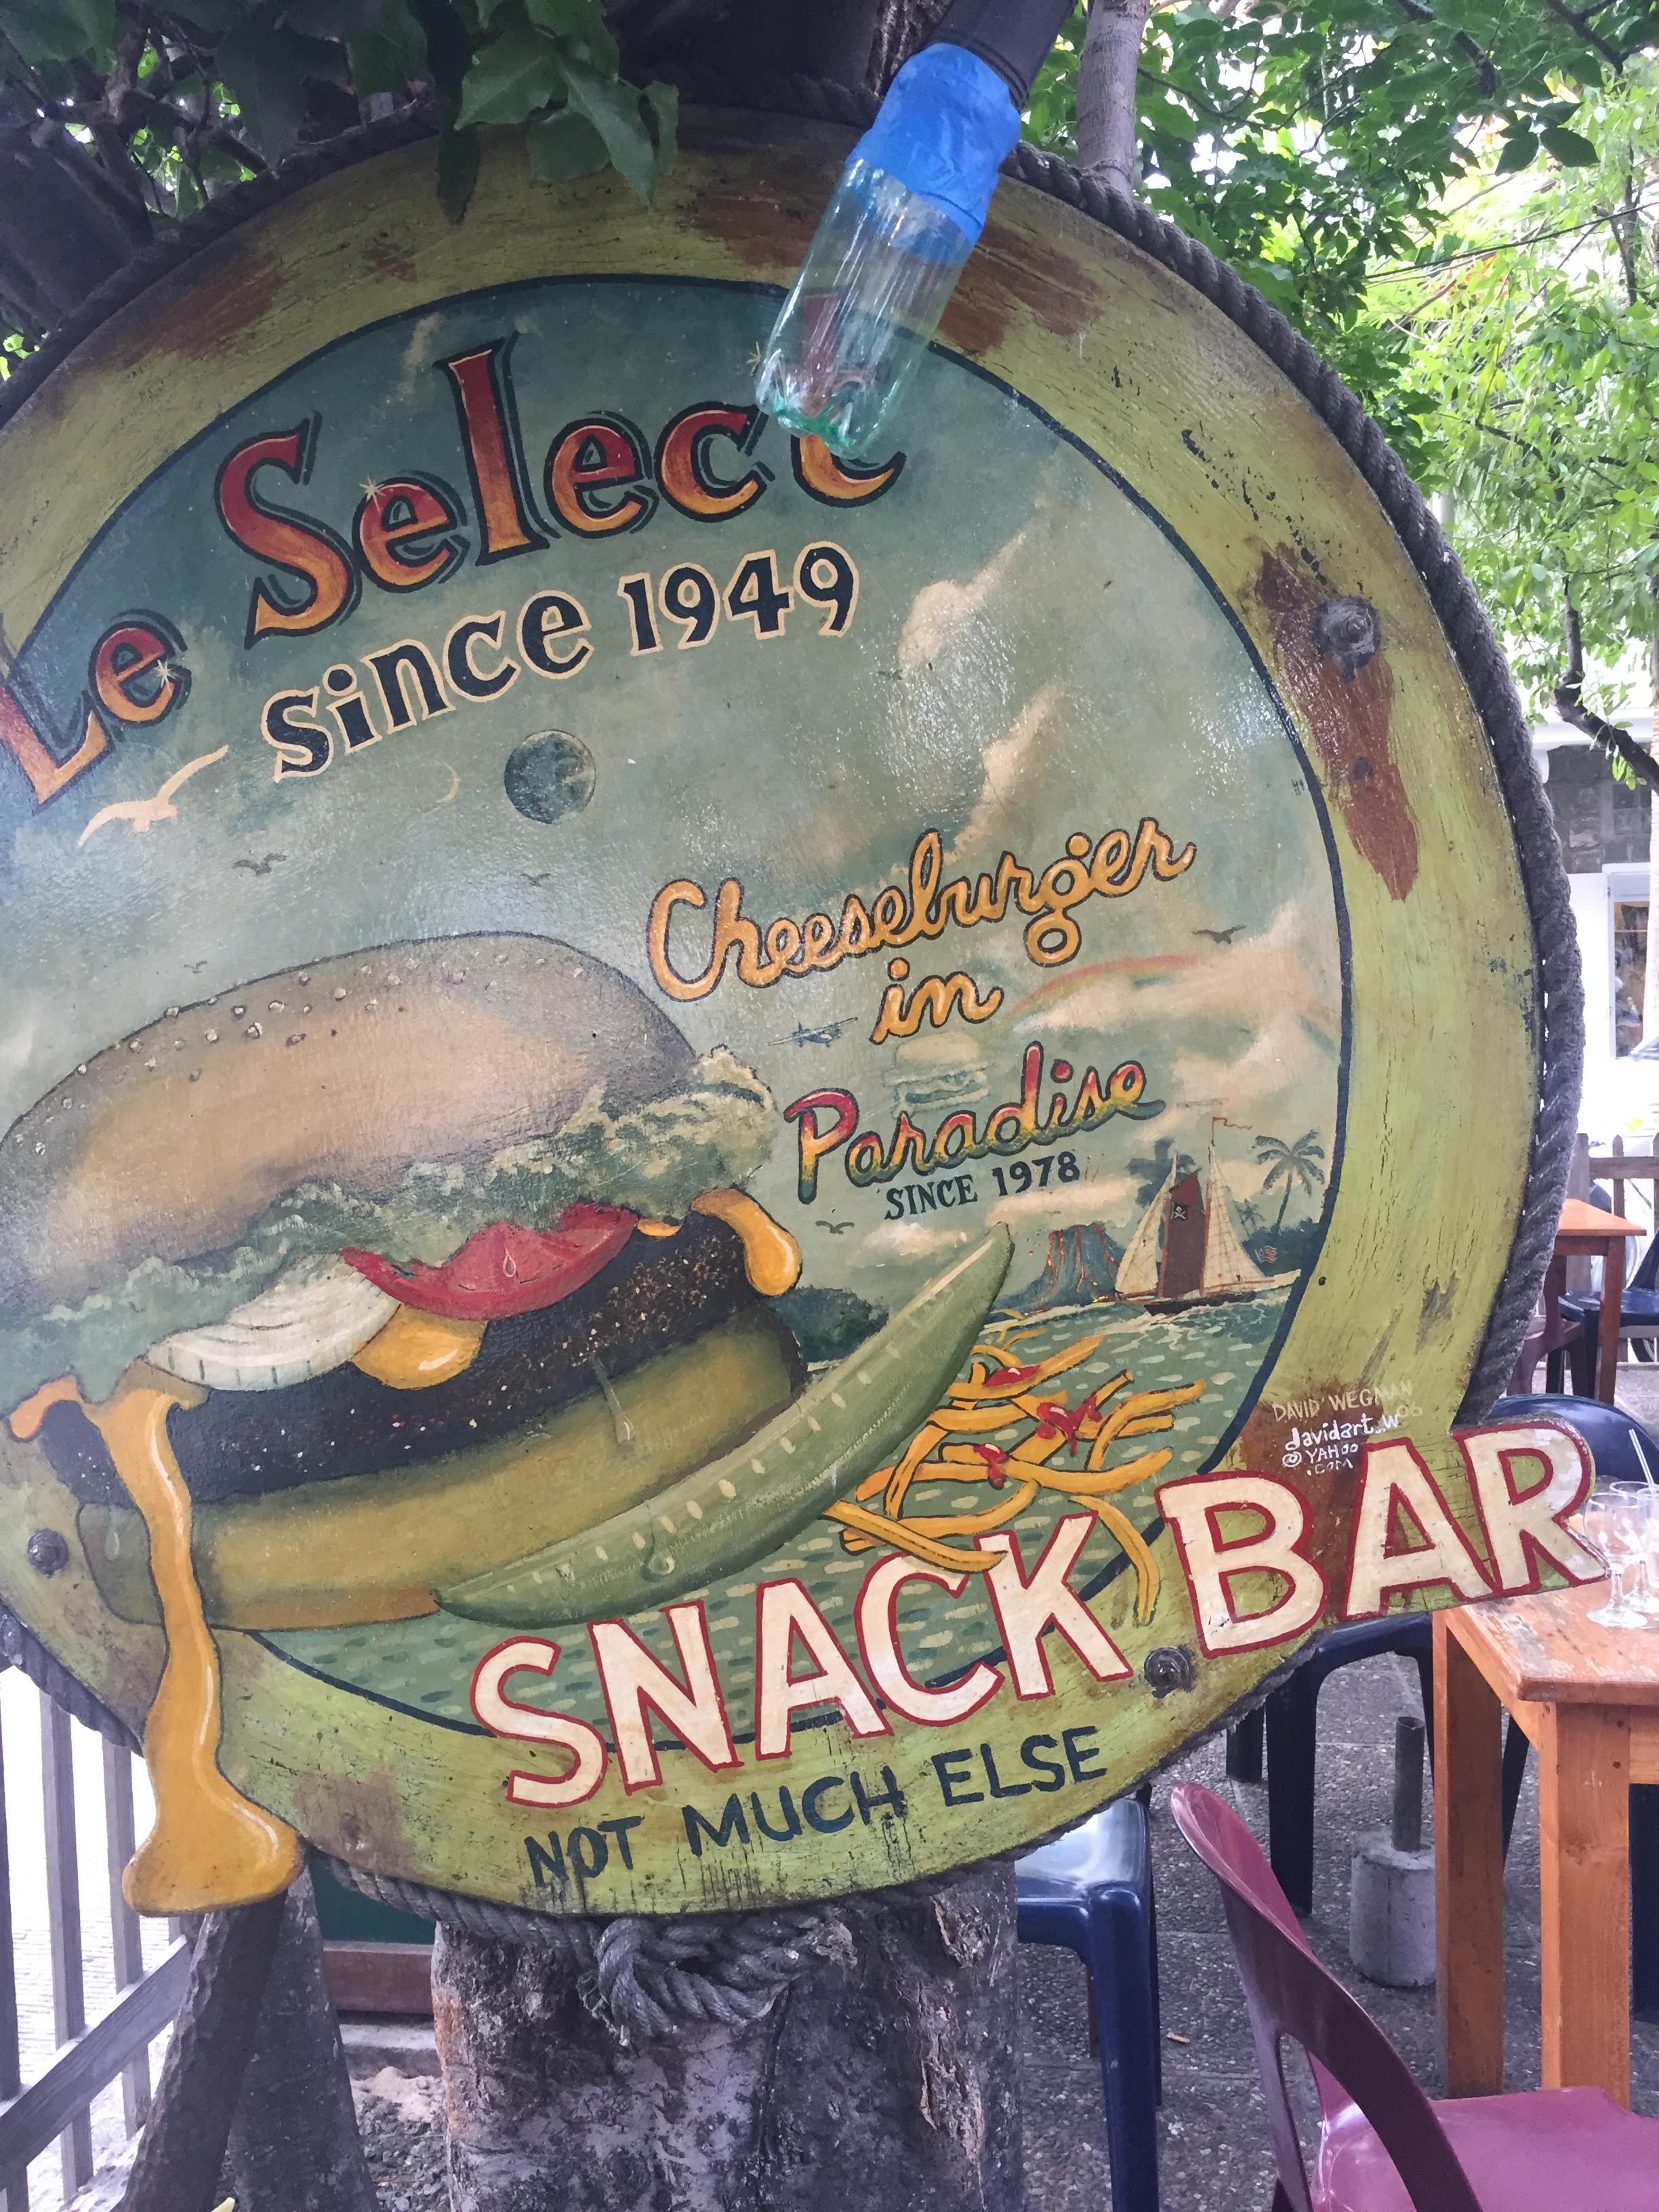 Famous Le Select sign